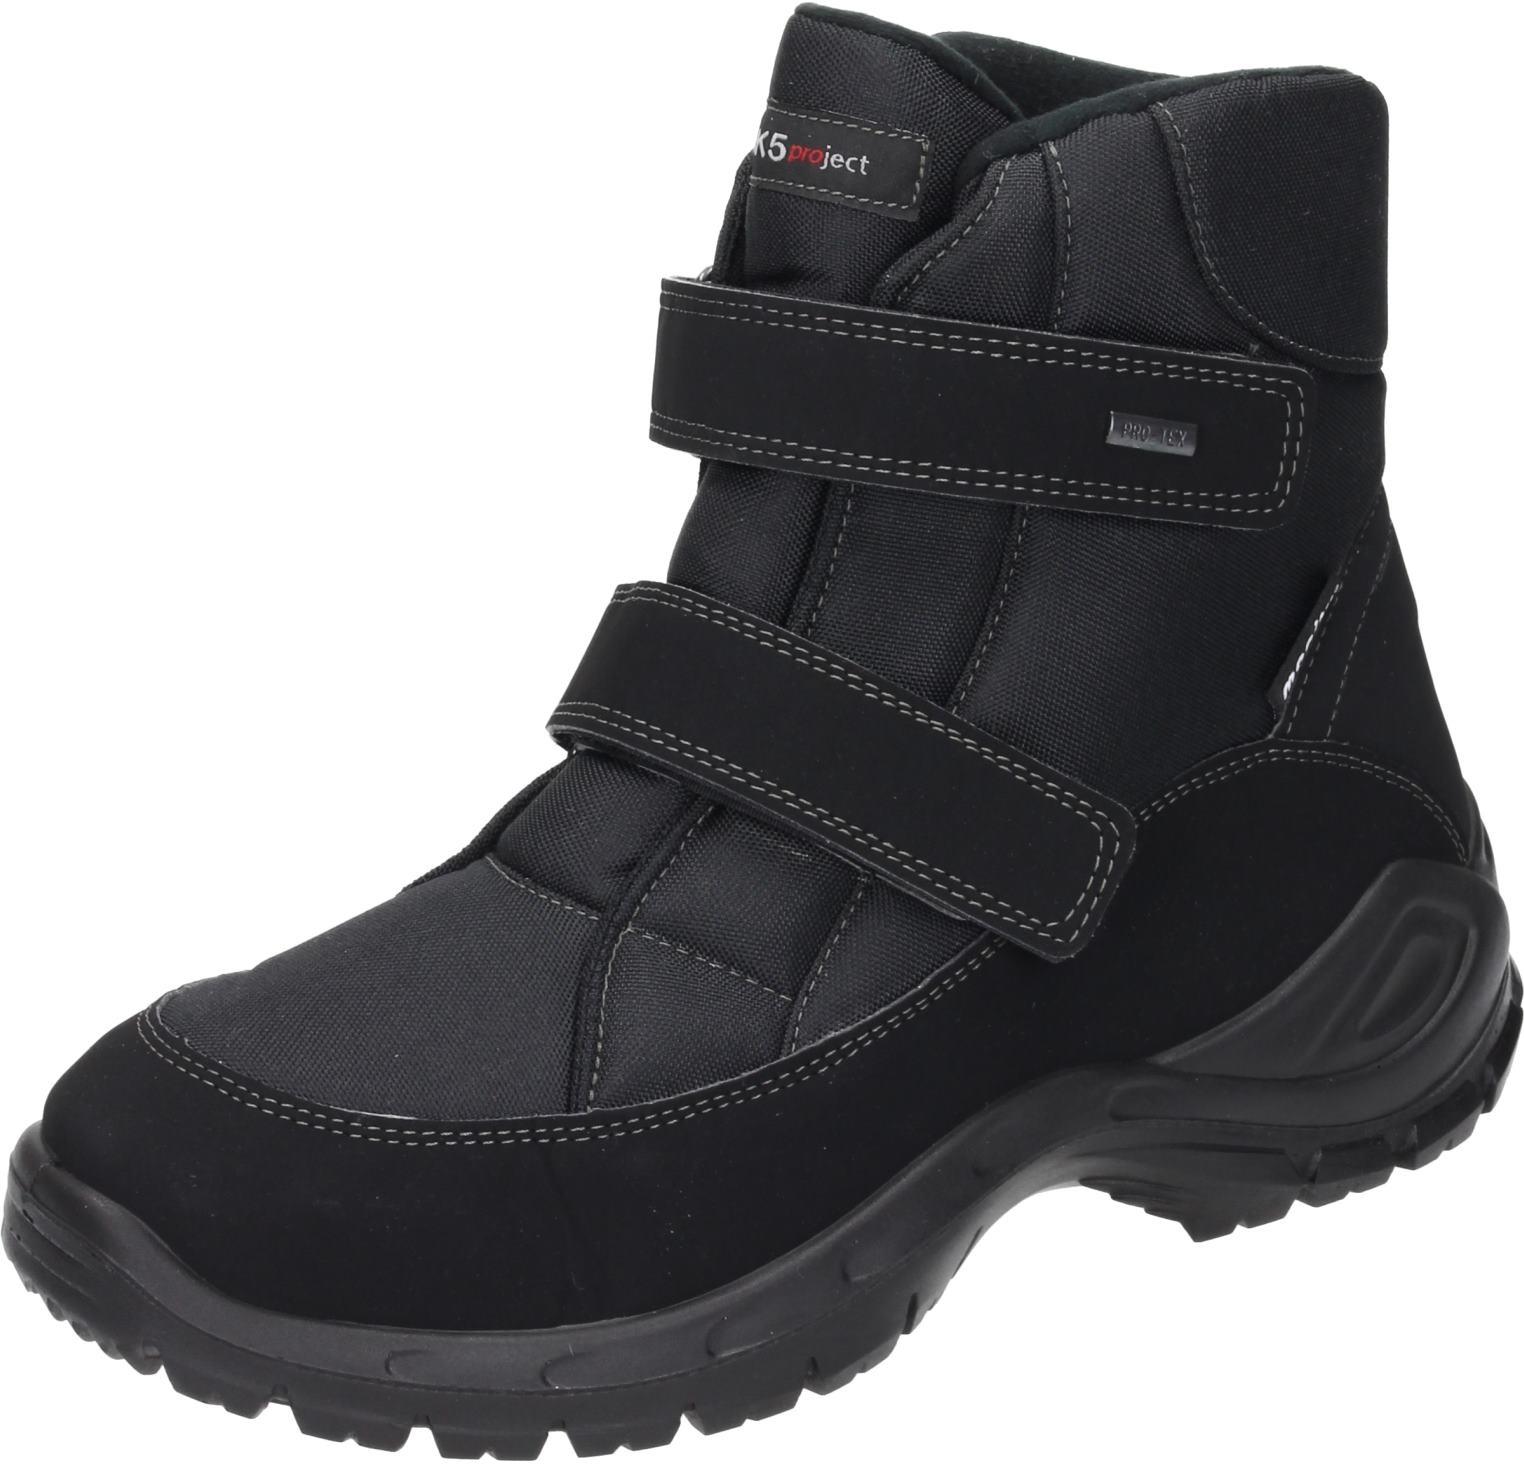 Polar-Tex Herren Schuhe Herren-Stiefel schwarz schwarz schwarz Textil NEU 530394